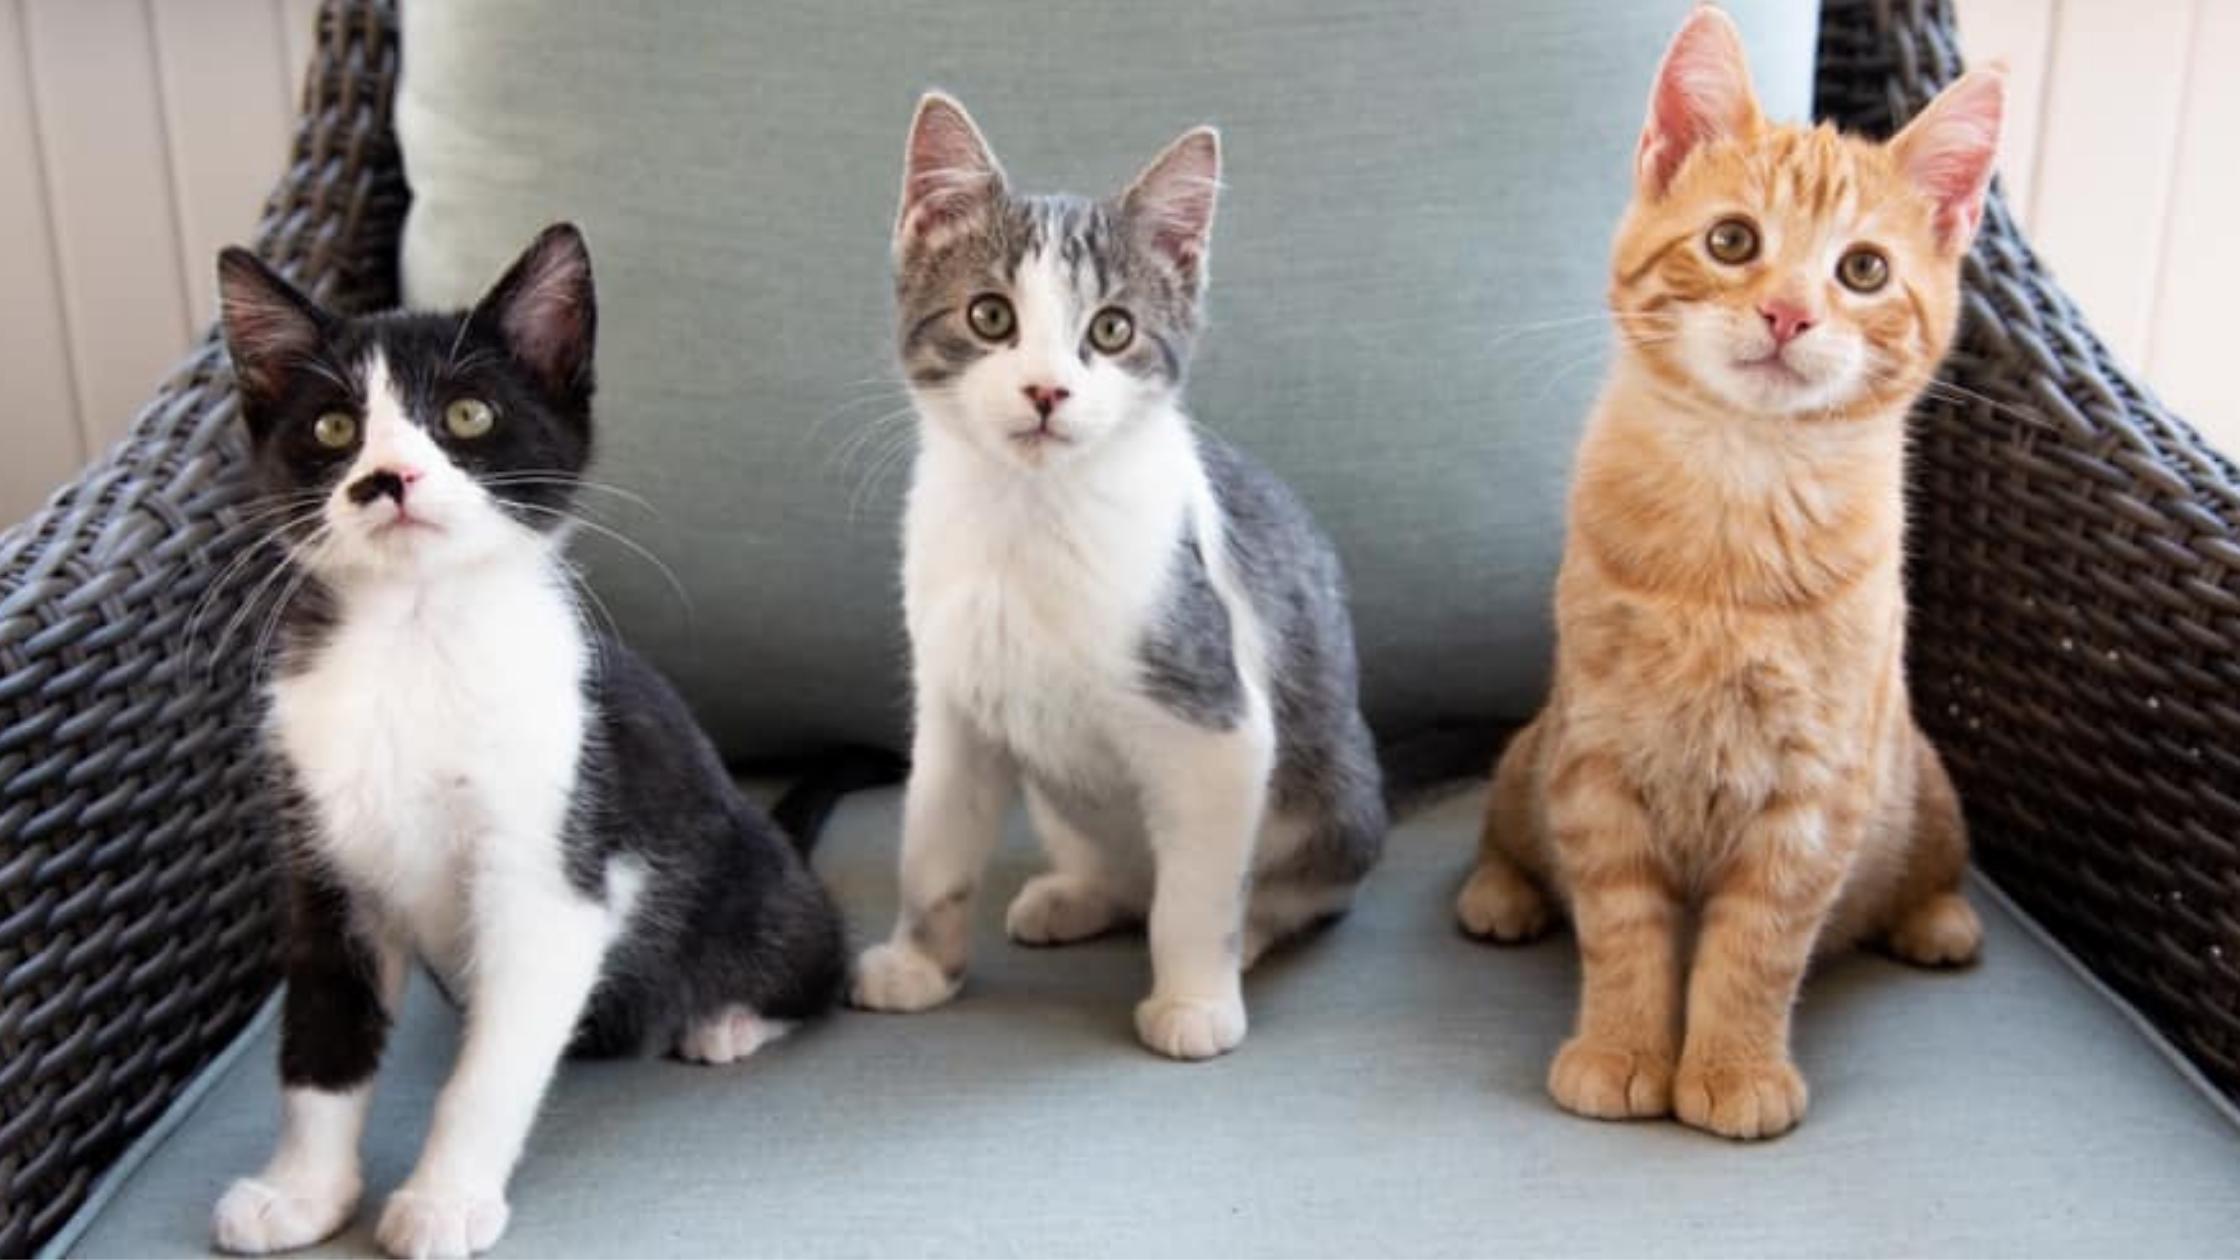 three kittens sitting on a chair